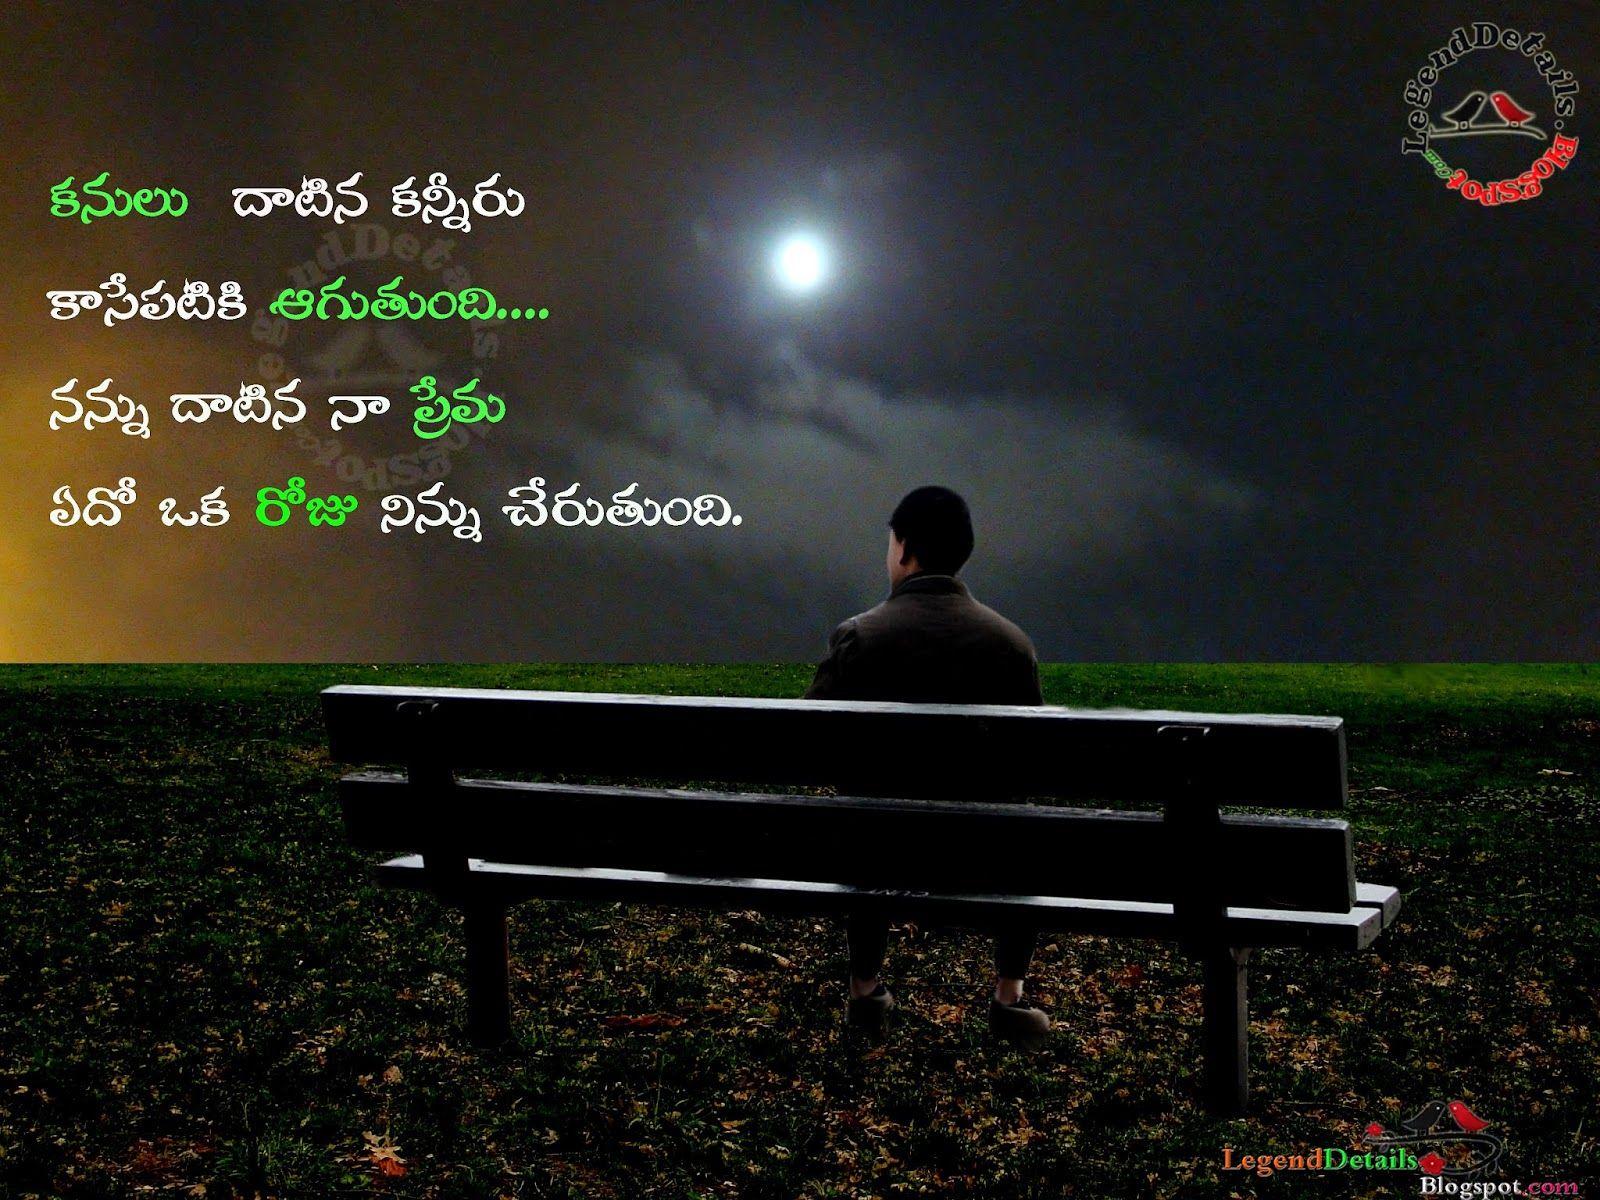 New Telugu Heart Breaking Love Quotes New Heart Touching Telugu